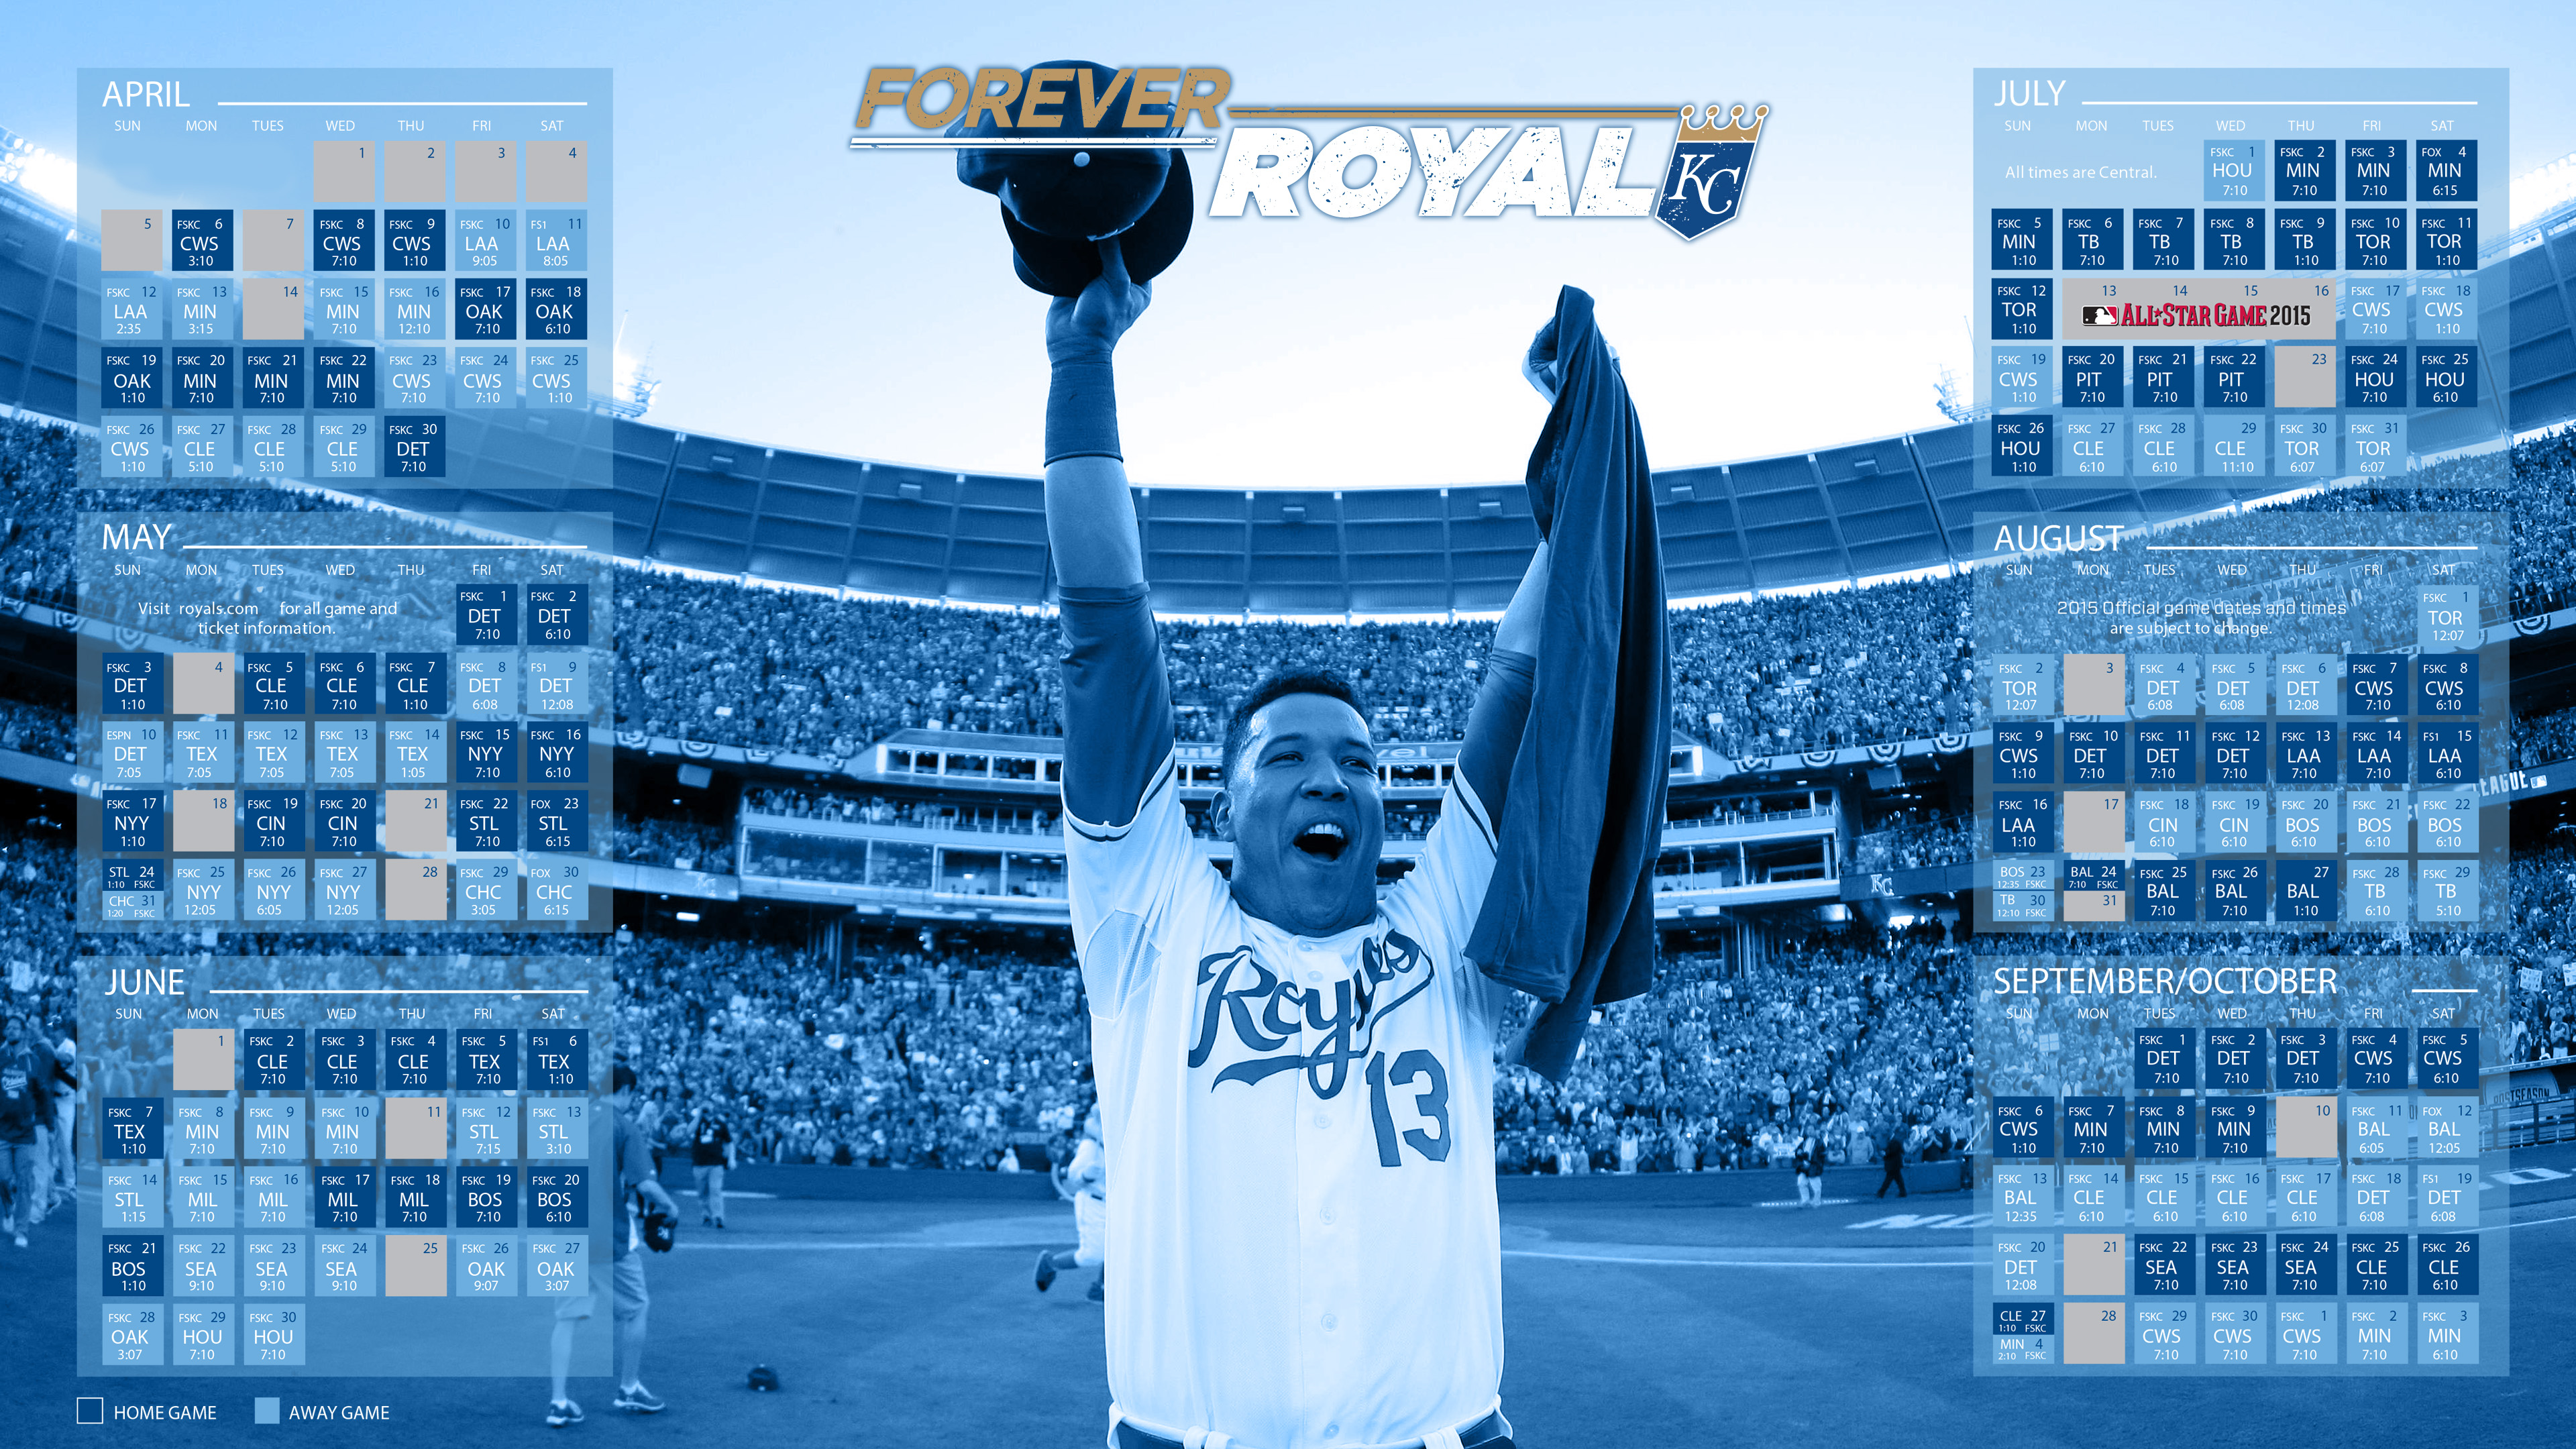 Kansas City Royals 2015 MLB Schedule 4K Wallpaper 3840x2160